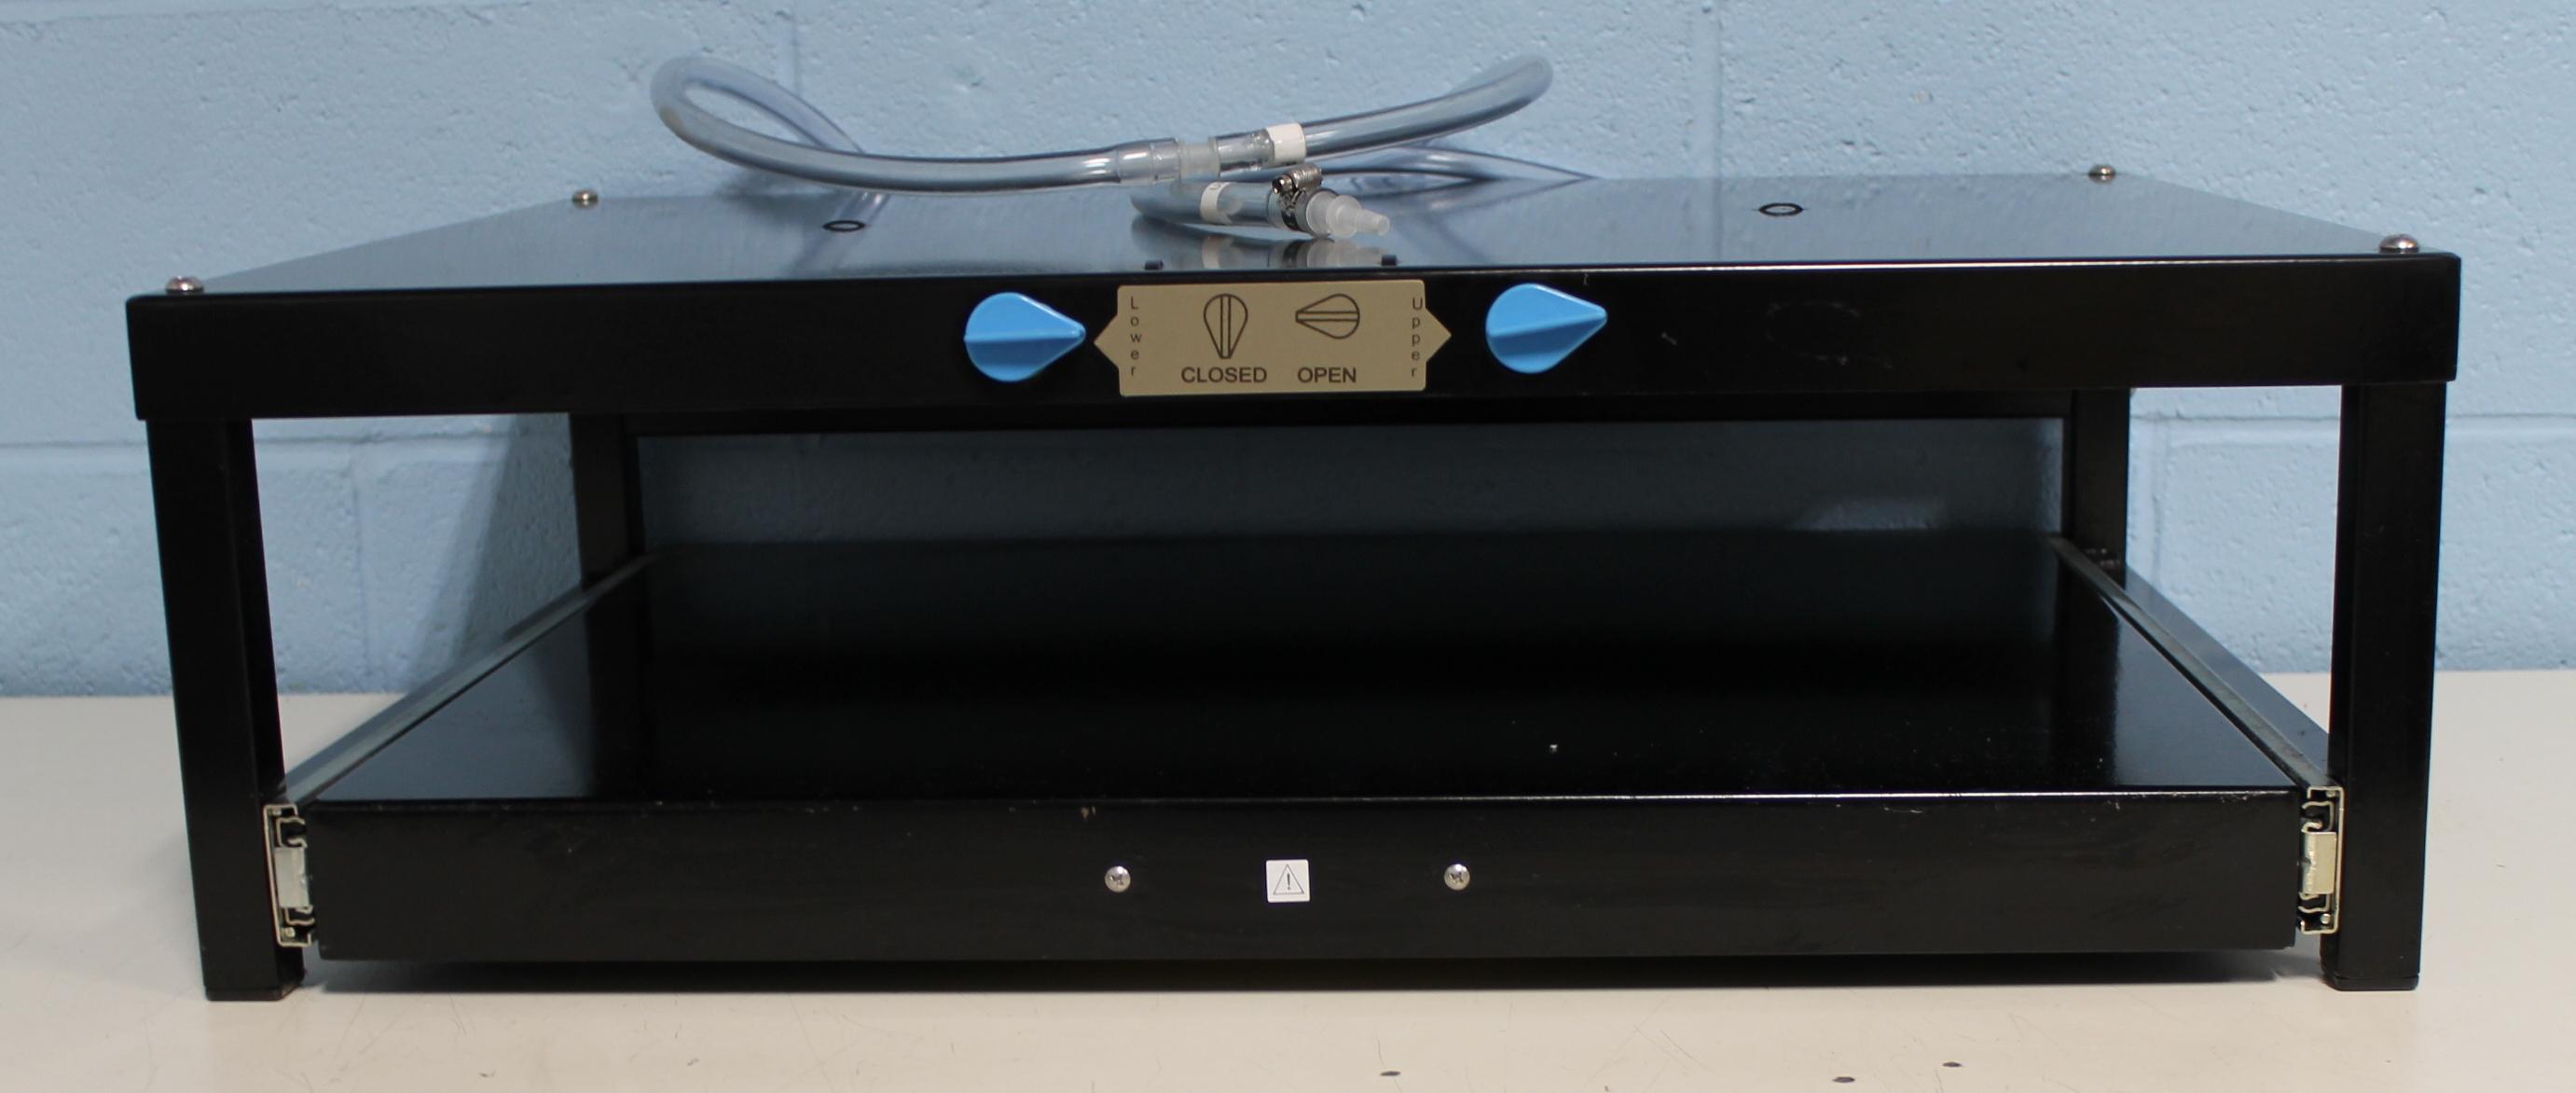 Bio-Rad Double-Up Gel Dryer Rack Image